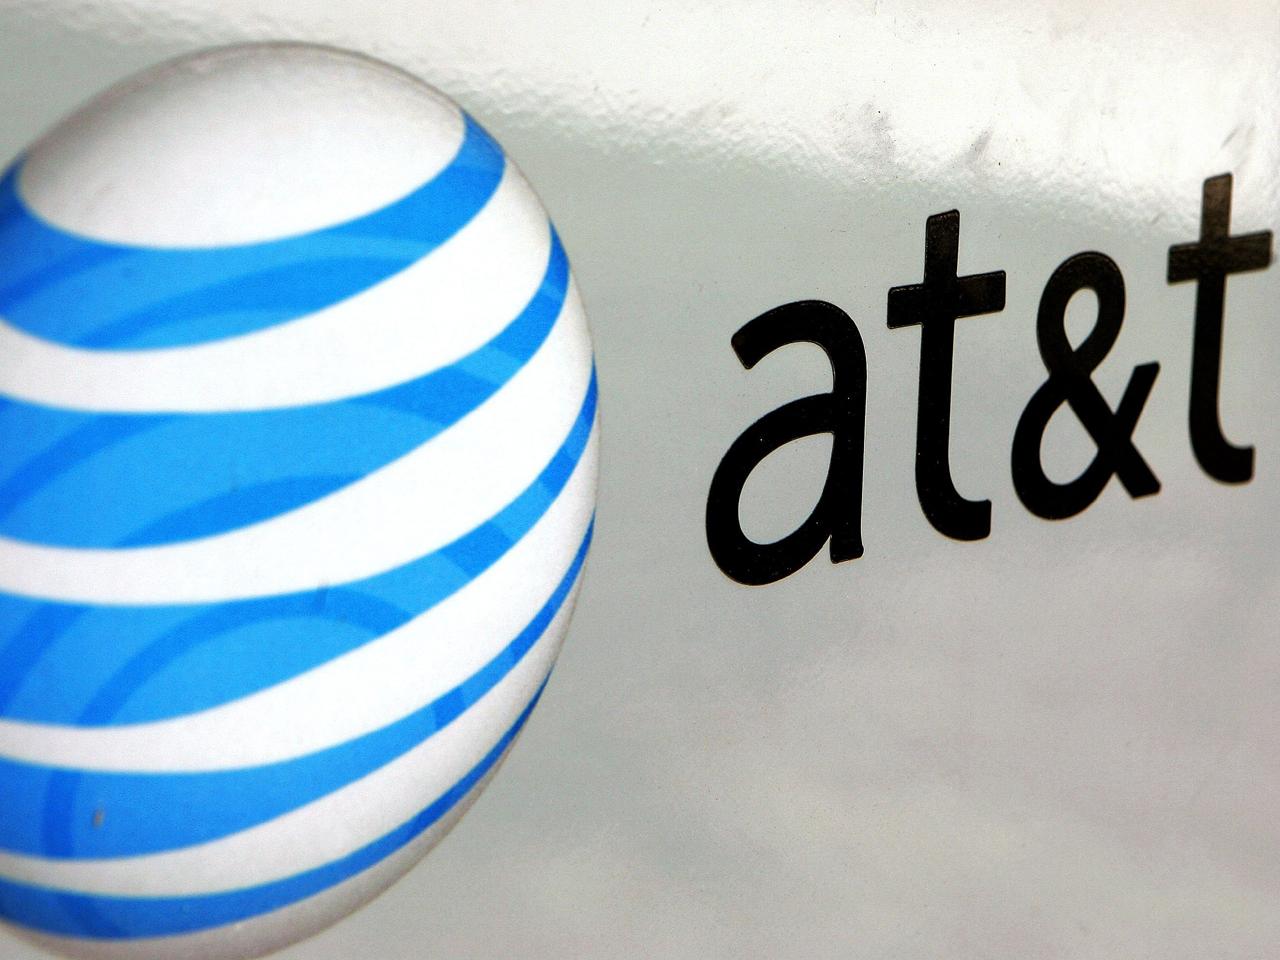 AT&T Reports 81 Percent Rise In Q2 Profit_509784